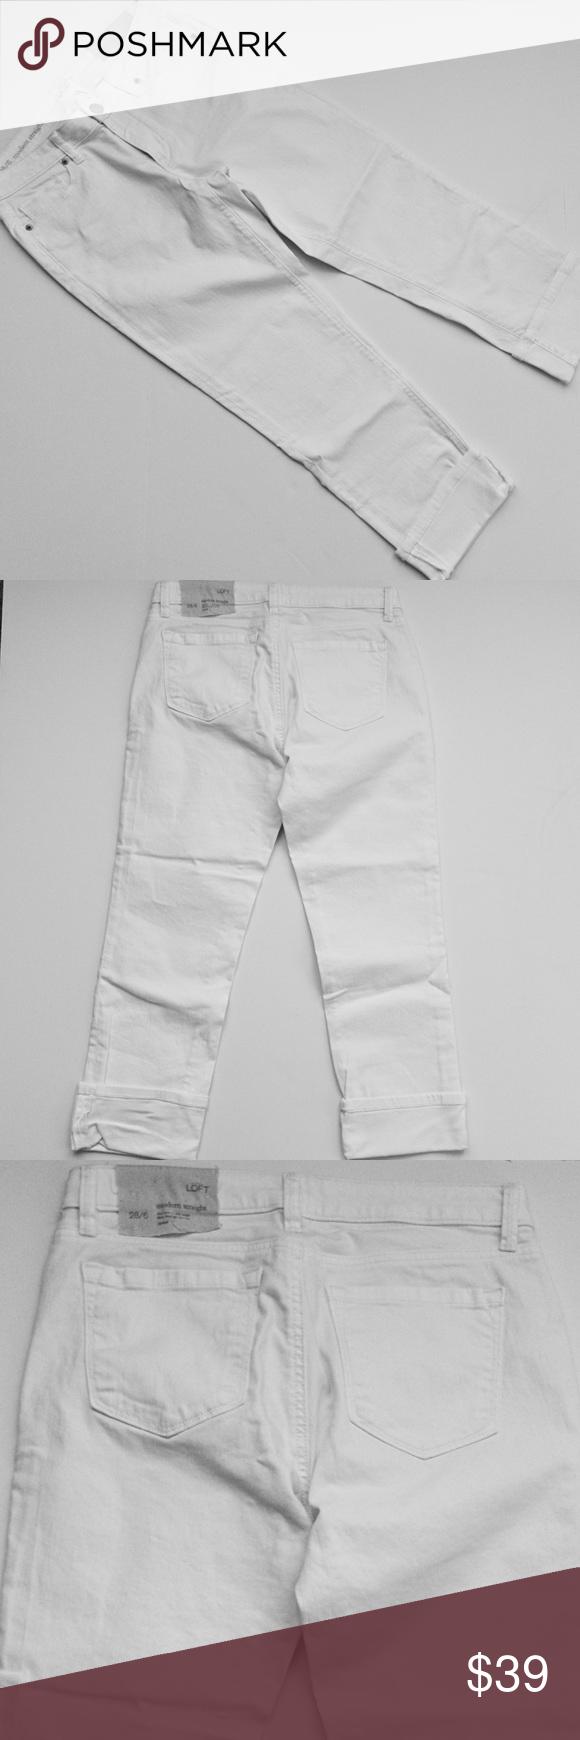 "ANN TAYLOR LOFT white modern straight denim NWT! Modern straight leg stretch denim. Sits low on the waist, slim through the hip. Fabric: cotton/spandex. Inseam: 24"" LOFT Jeans Ankle & Cropped"